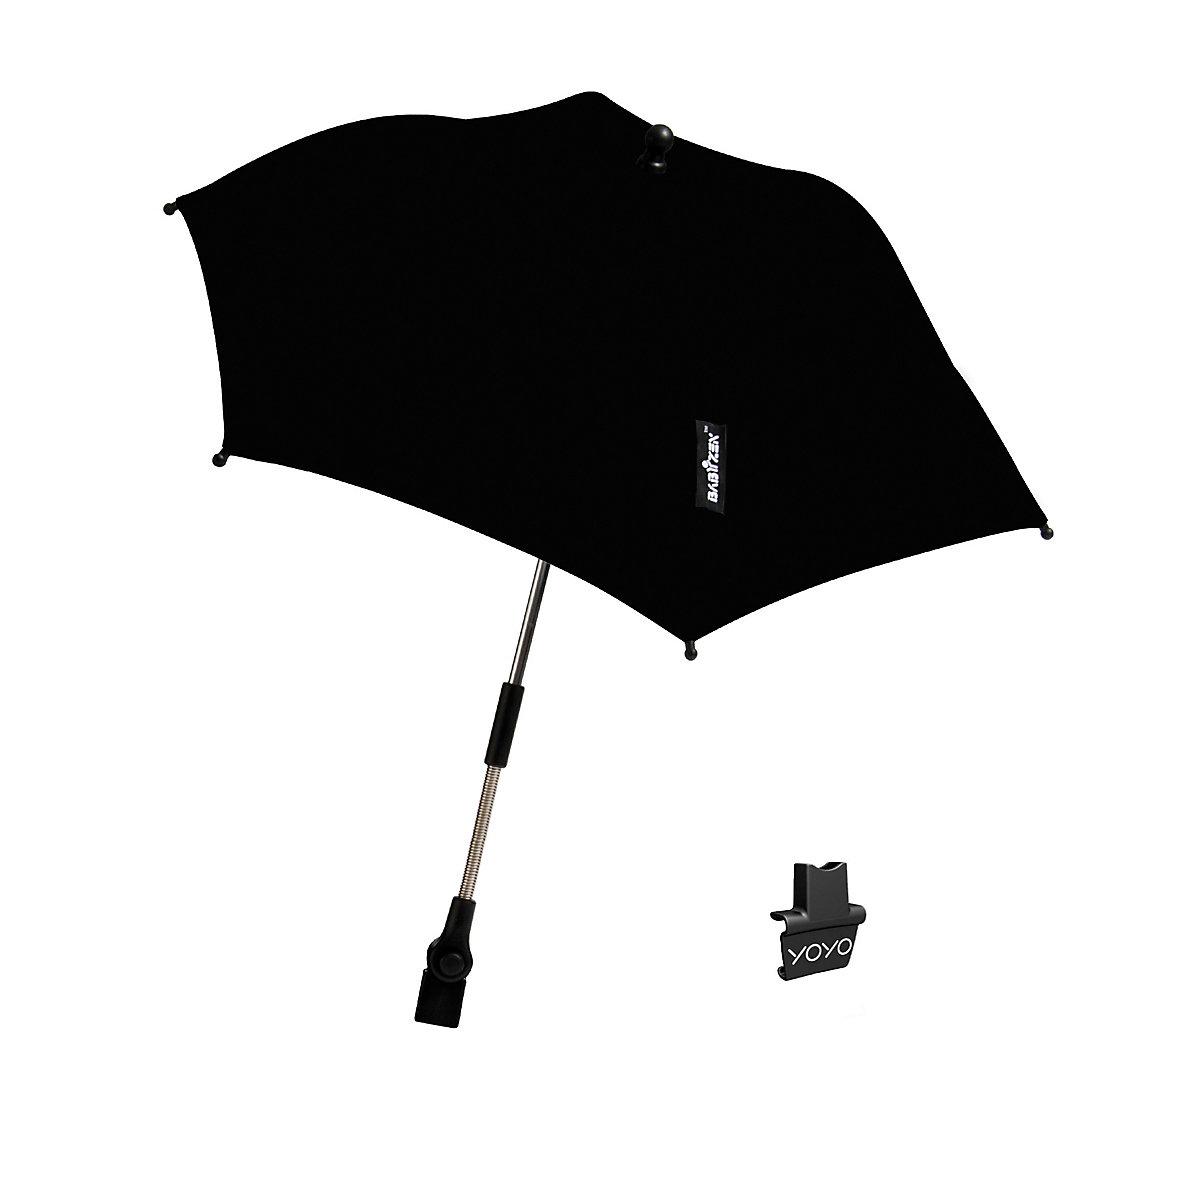 BABYZEN parasol - black